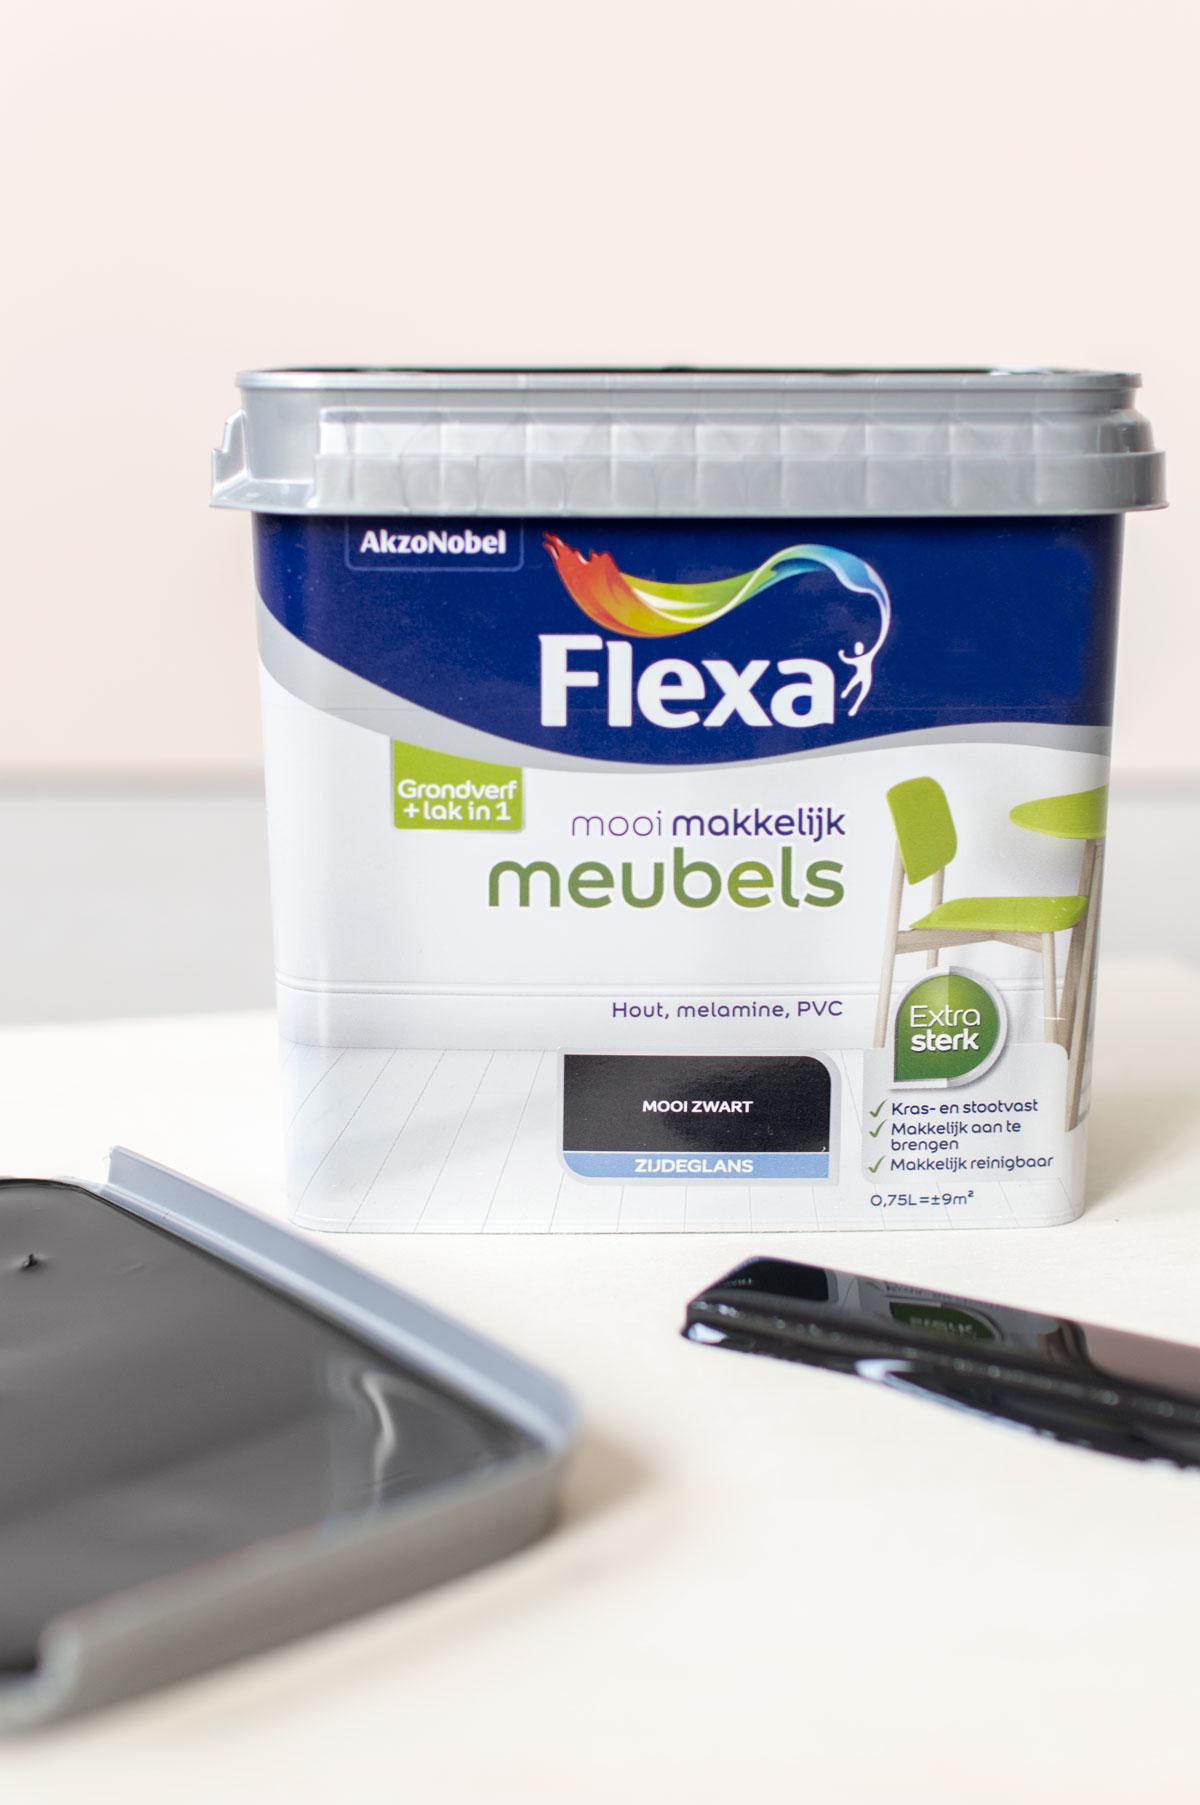 Flexa mooi makkelijk - Tanja van Hoogdalem